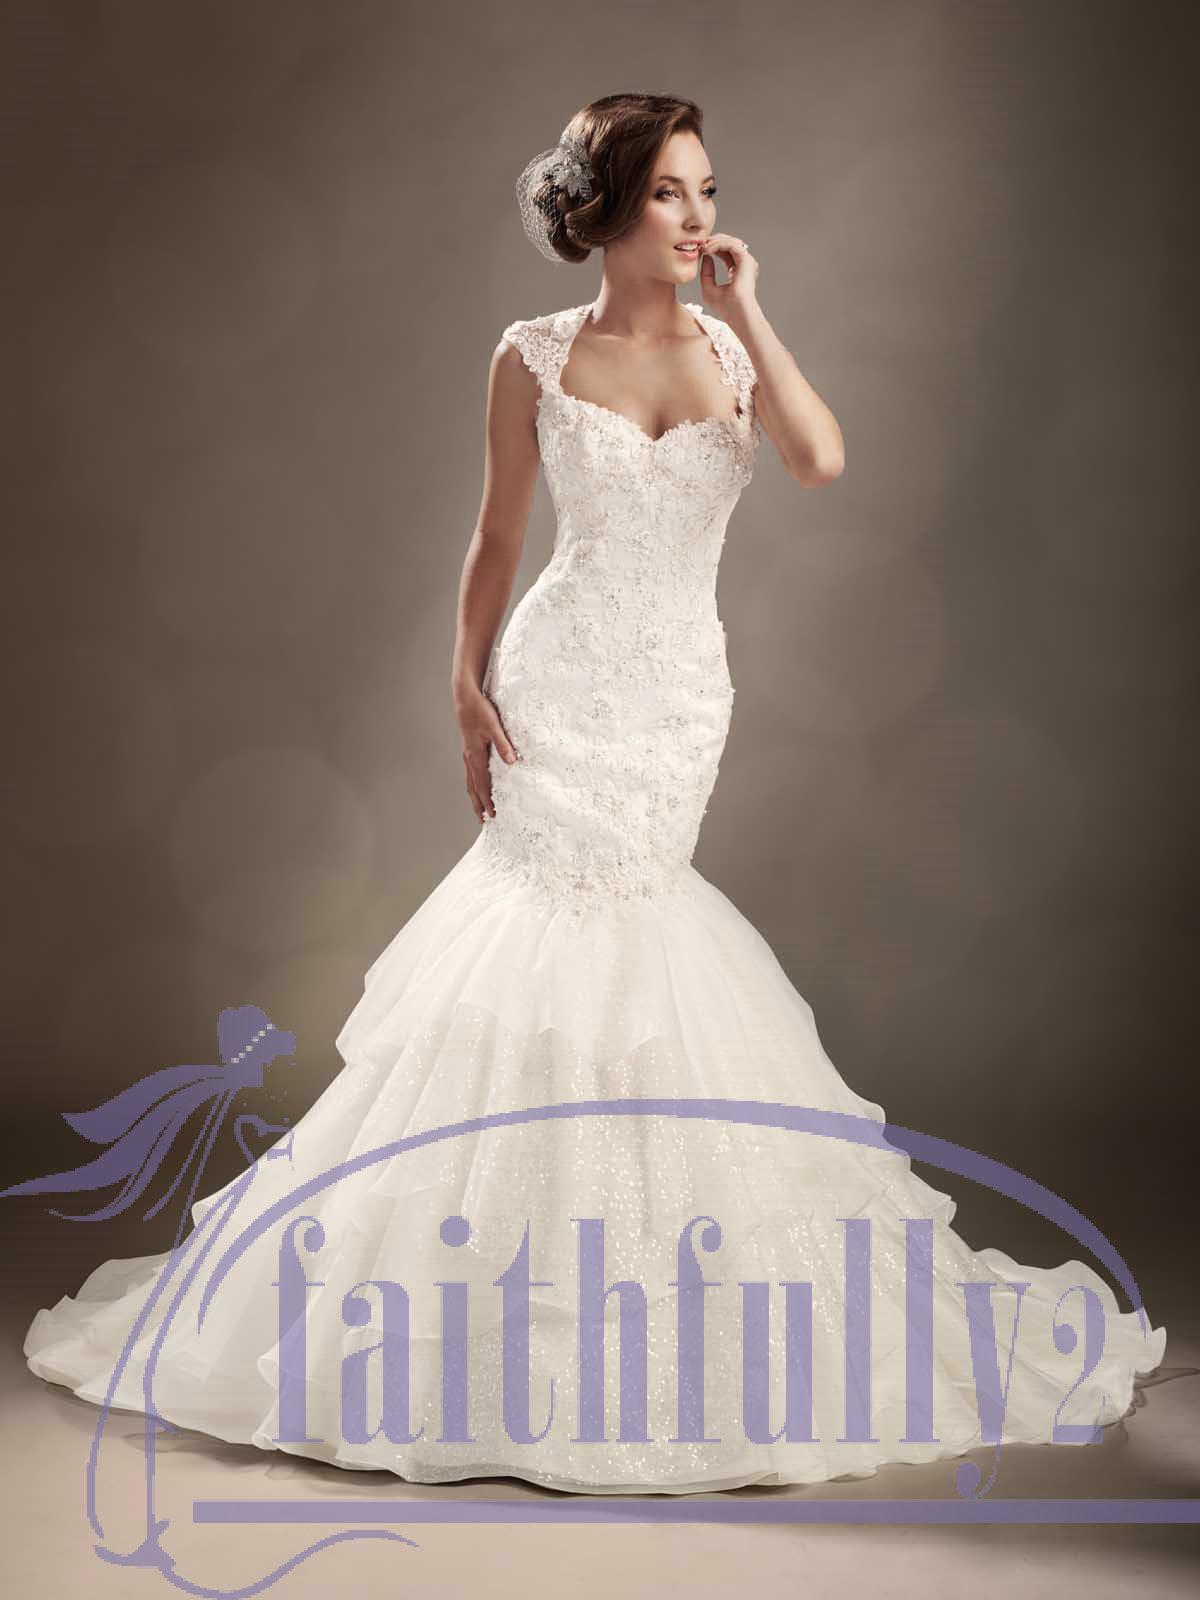 Pictures of winter mermaid wedding dresses cap sleeves for Winter mermaid wedding dresses